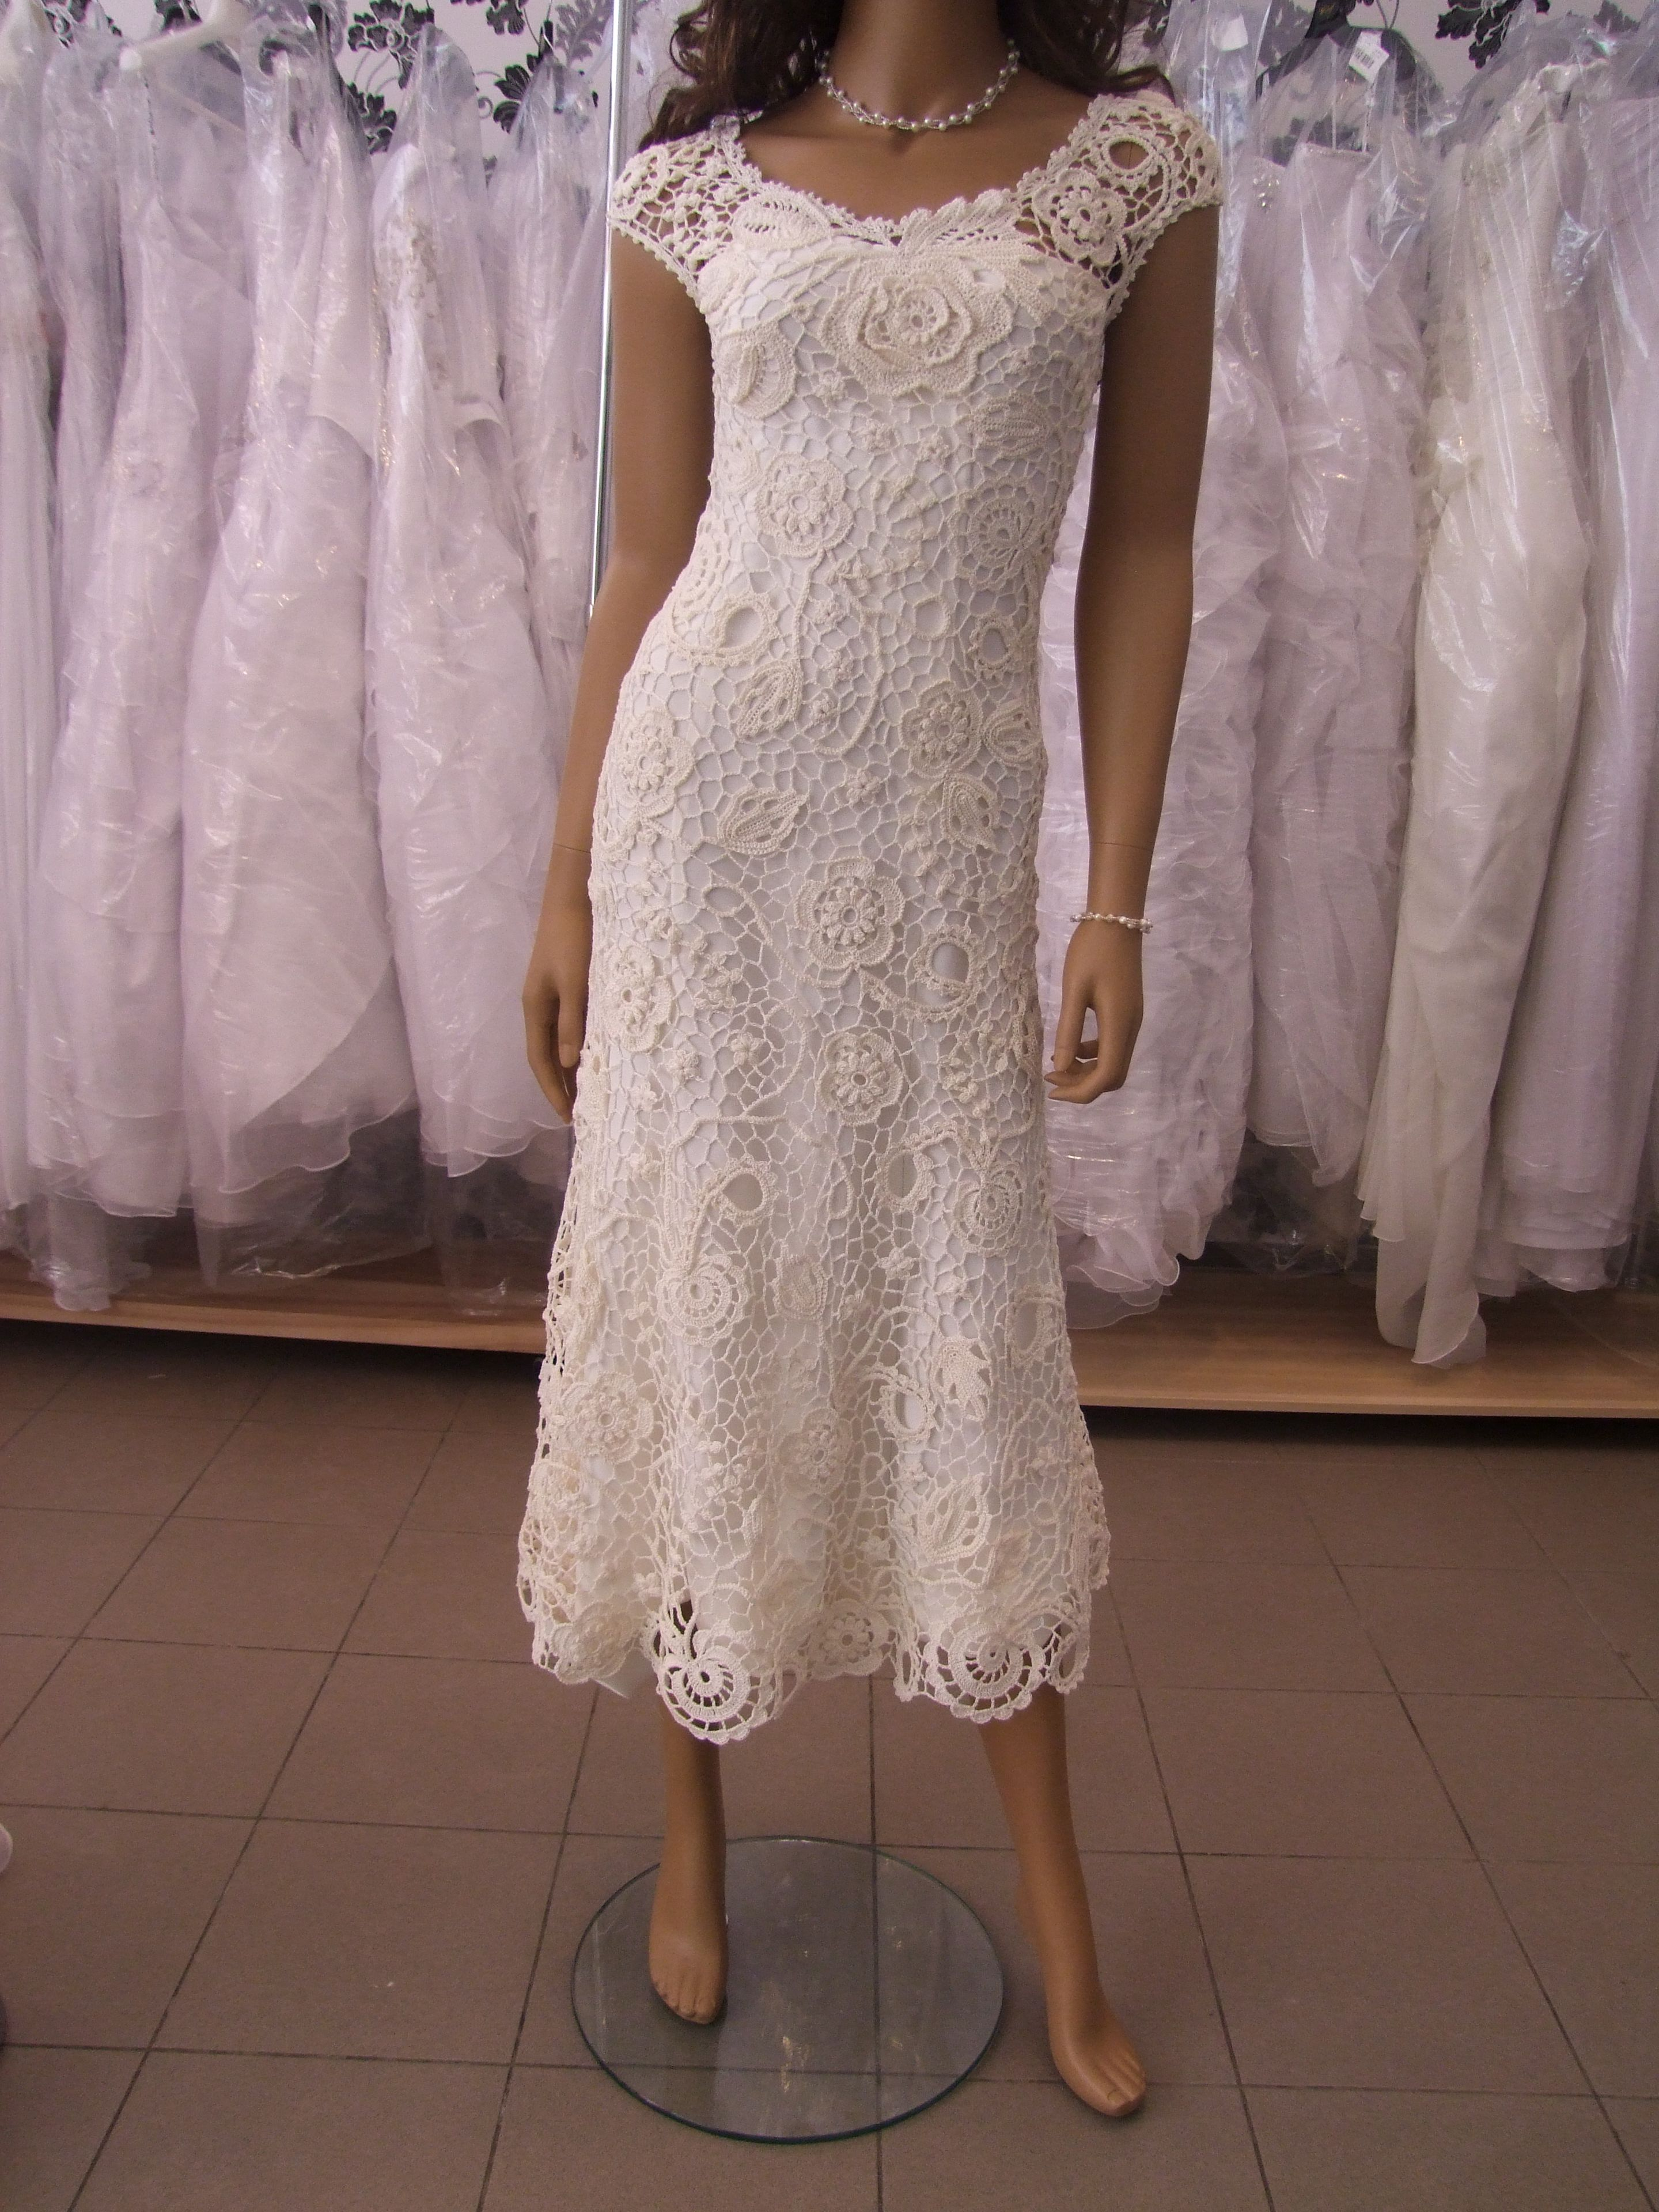 Irish crochet wedding dress Crochet wedding dresses